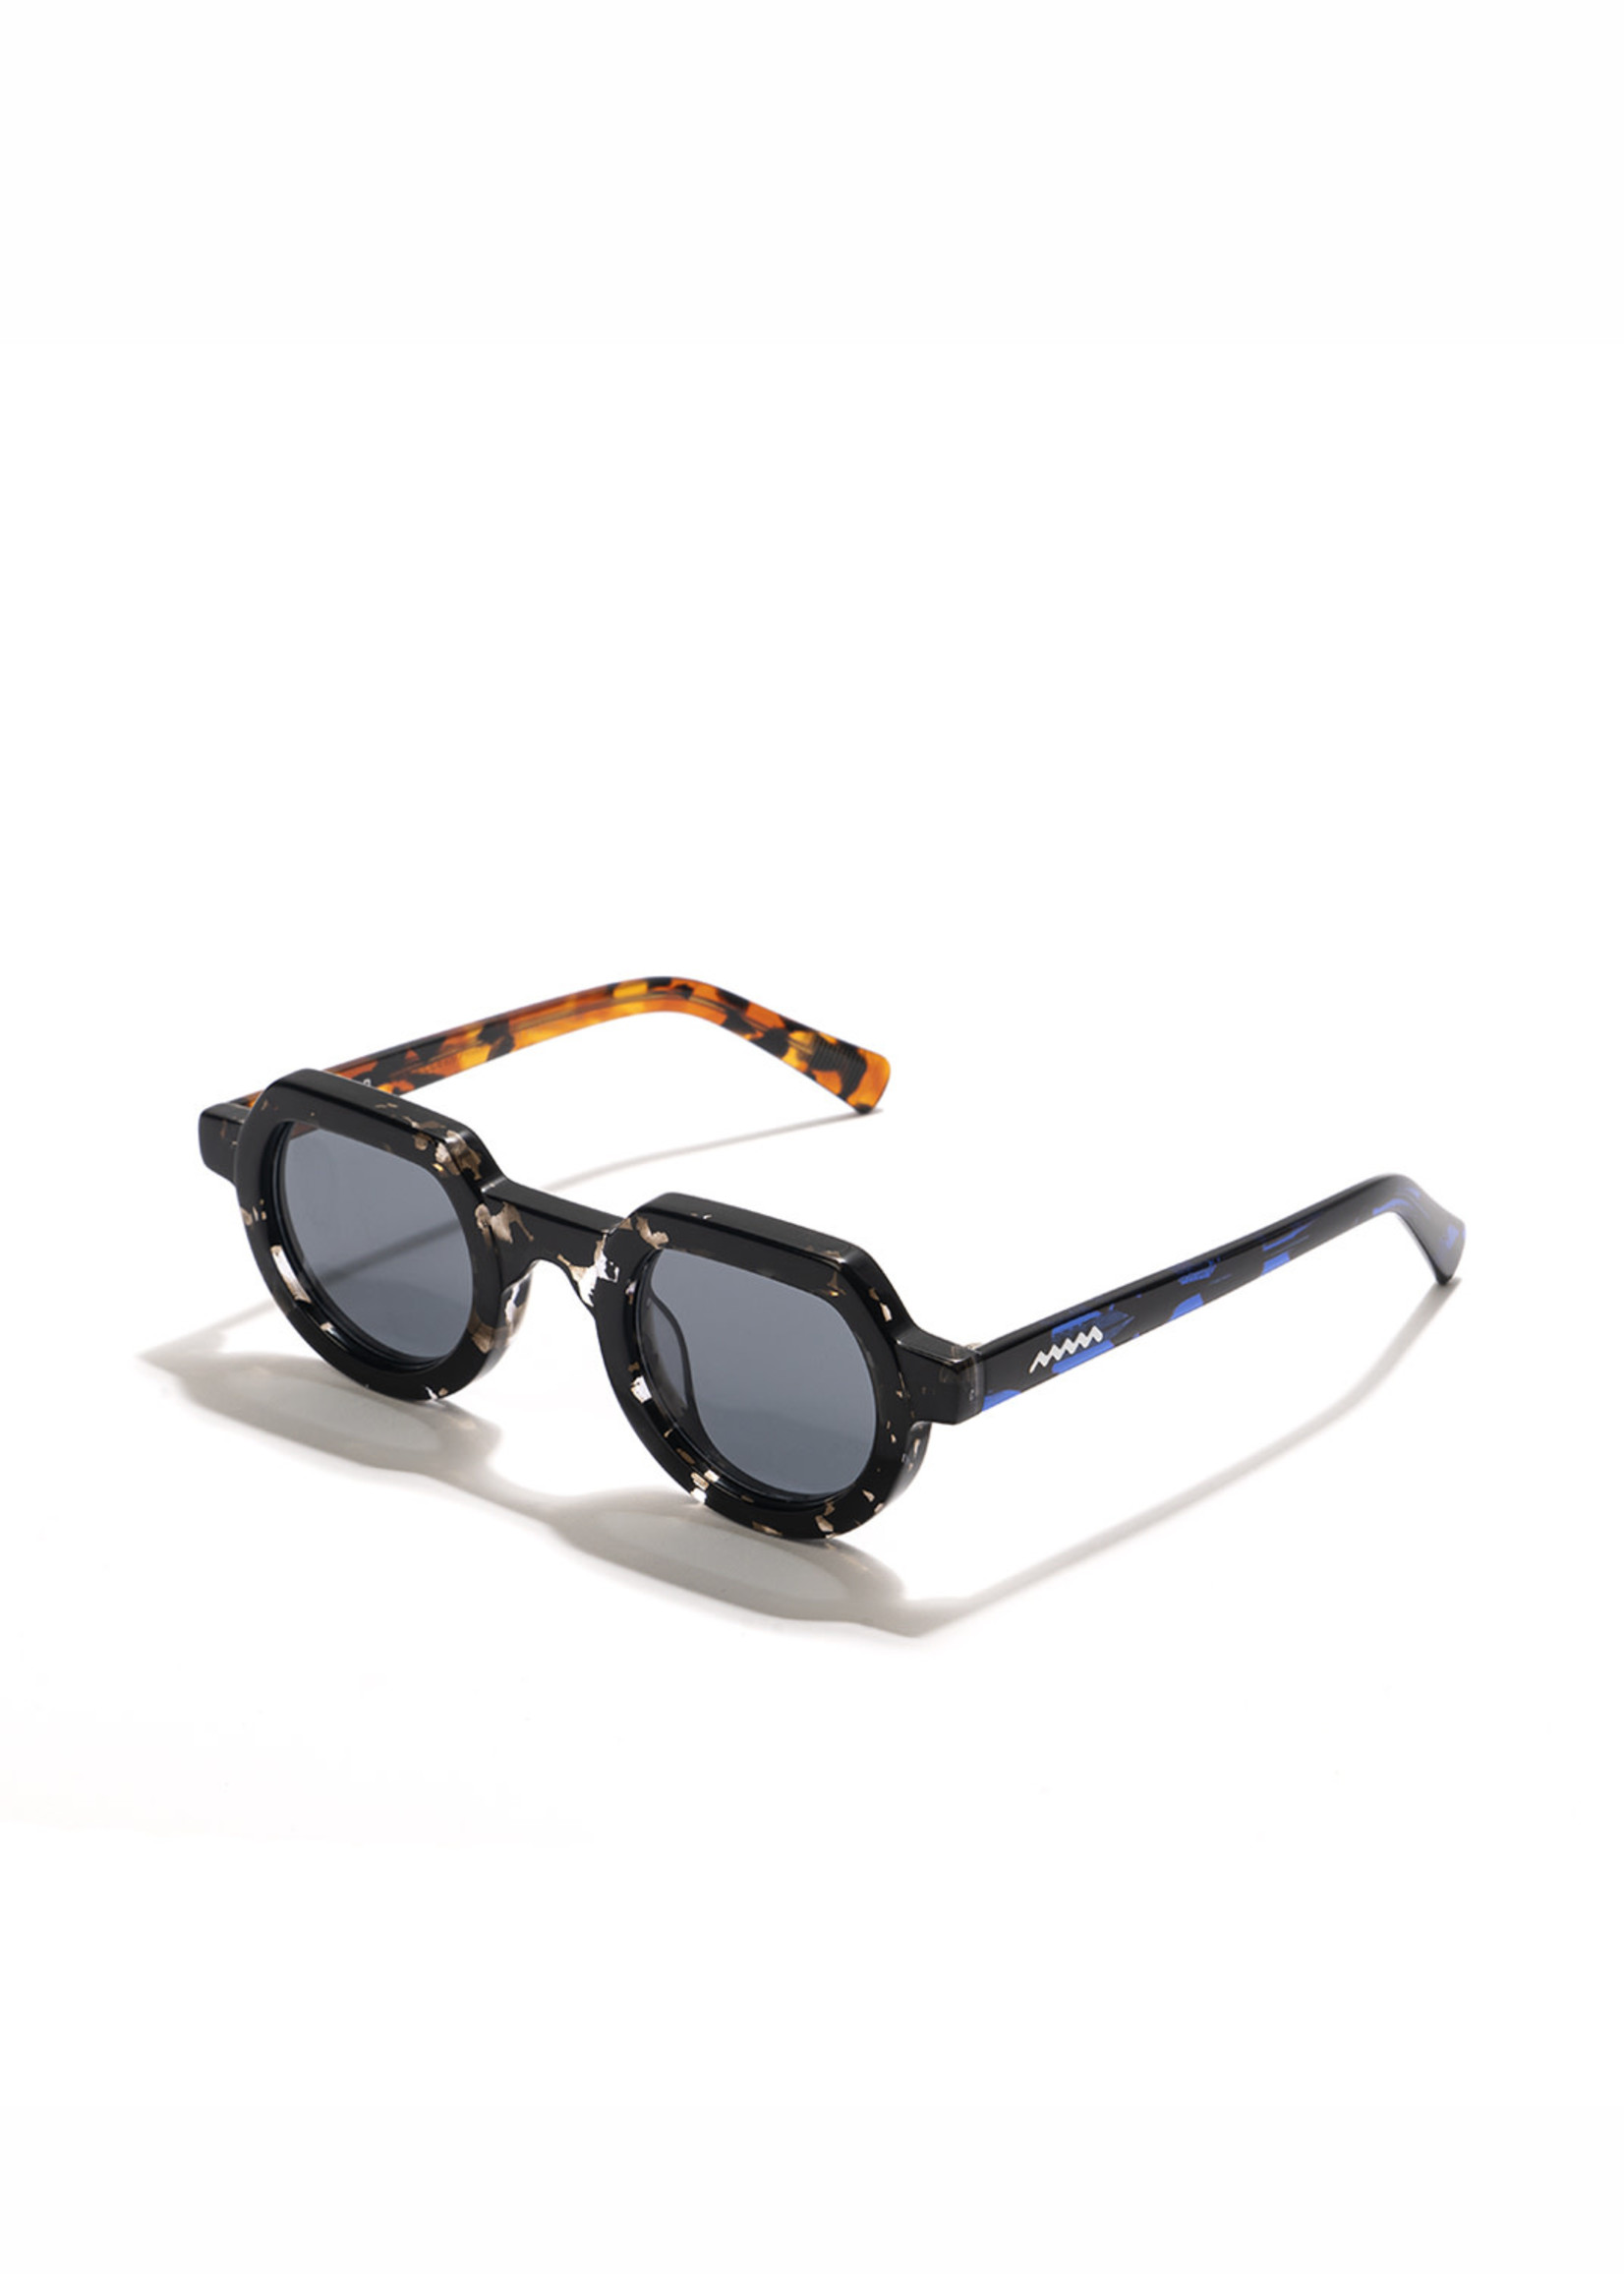 Brain Dead Tani Sunglasses in Multi-Tortoise